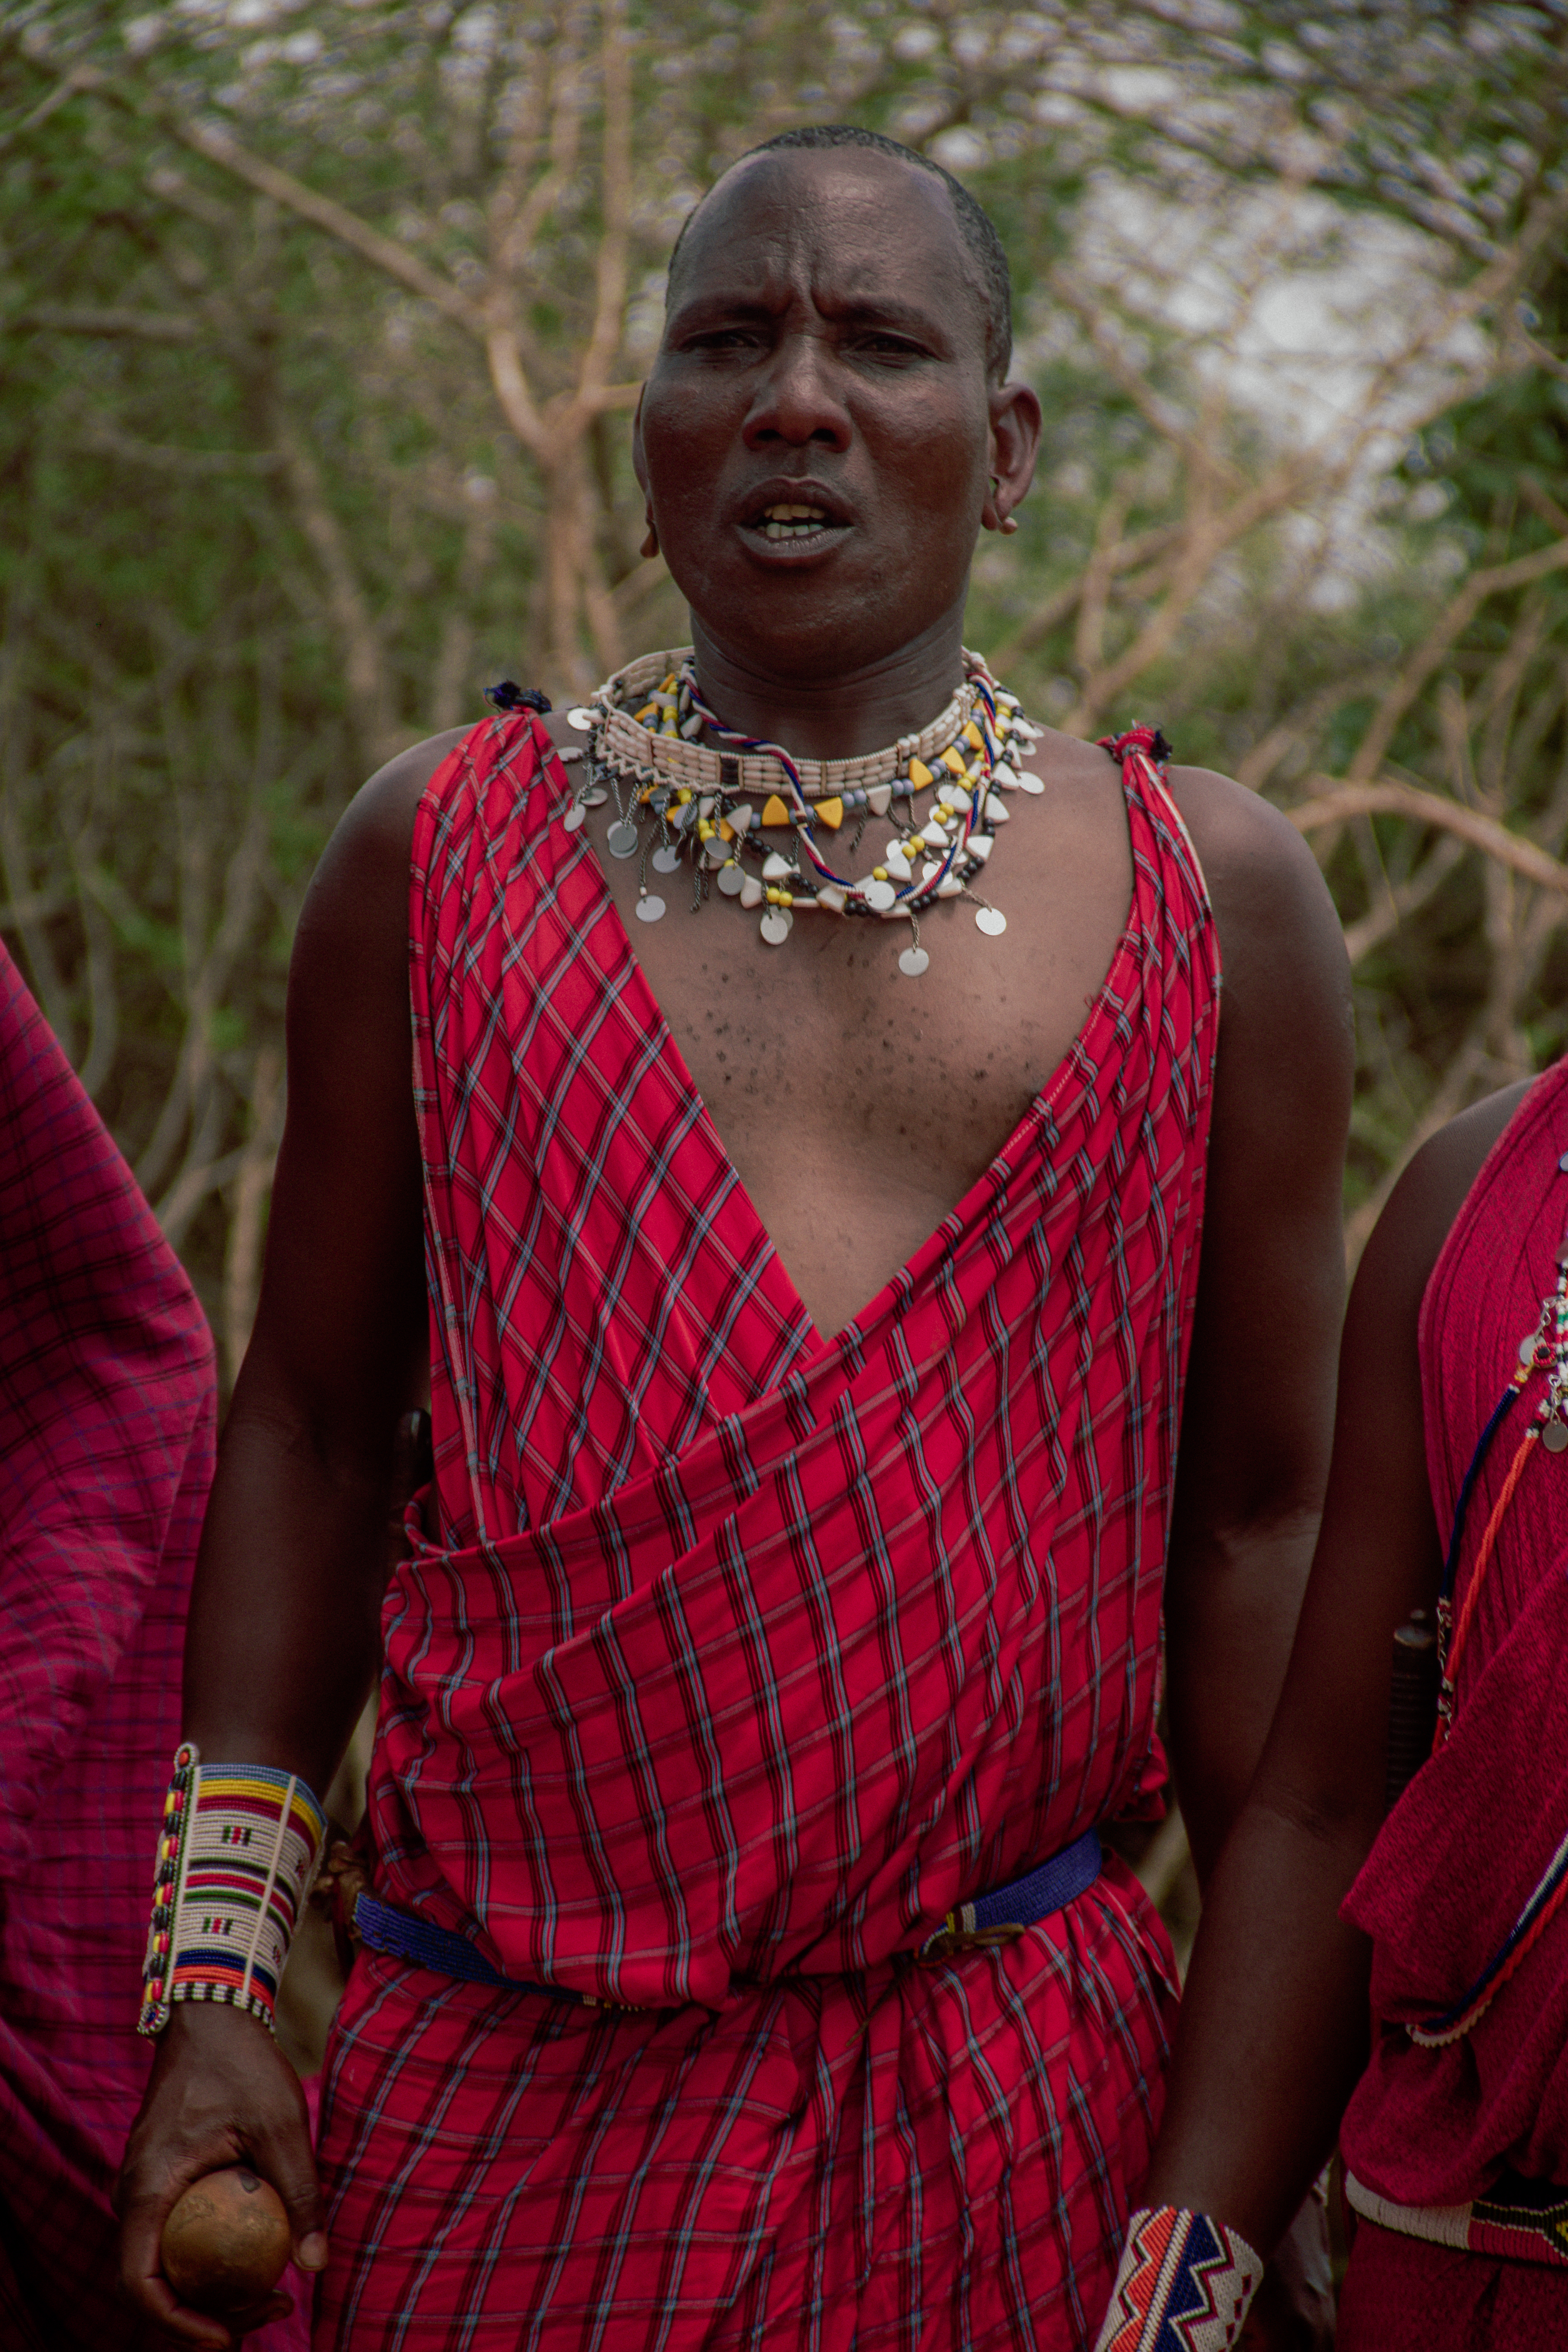 African tribal dress